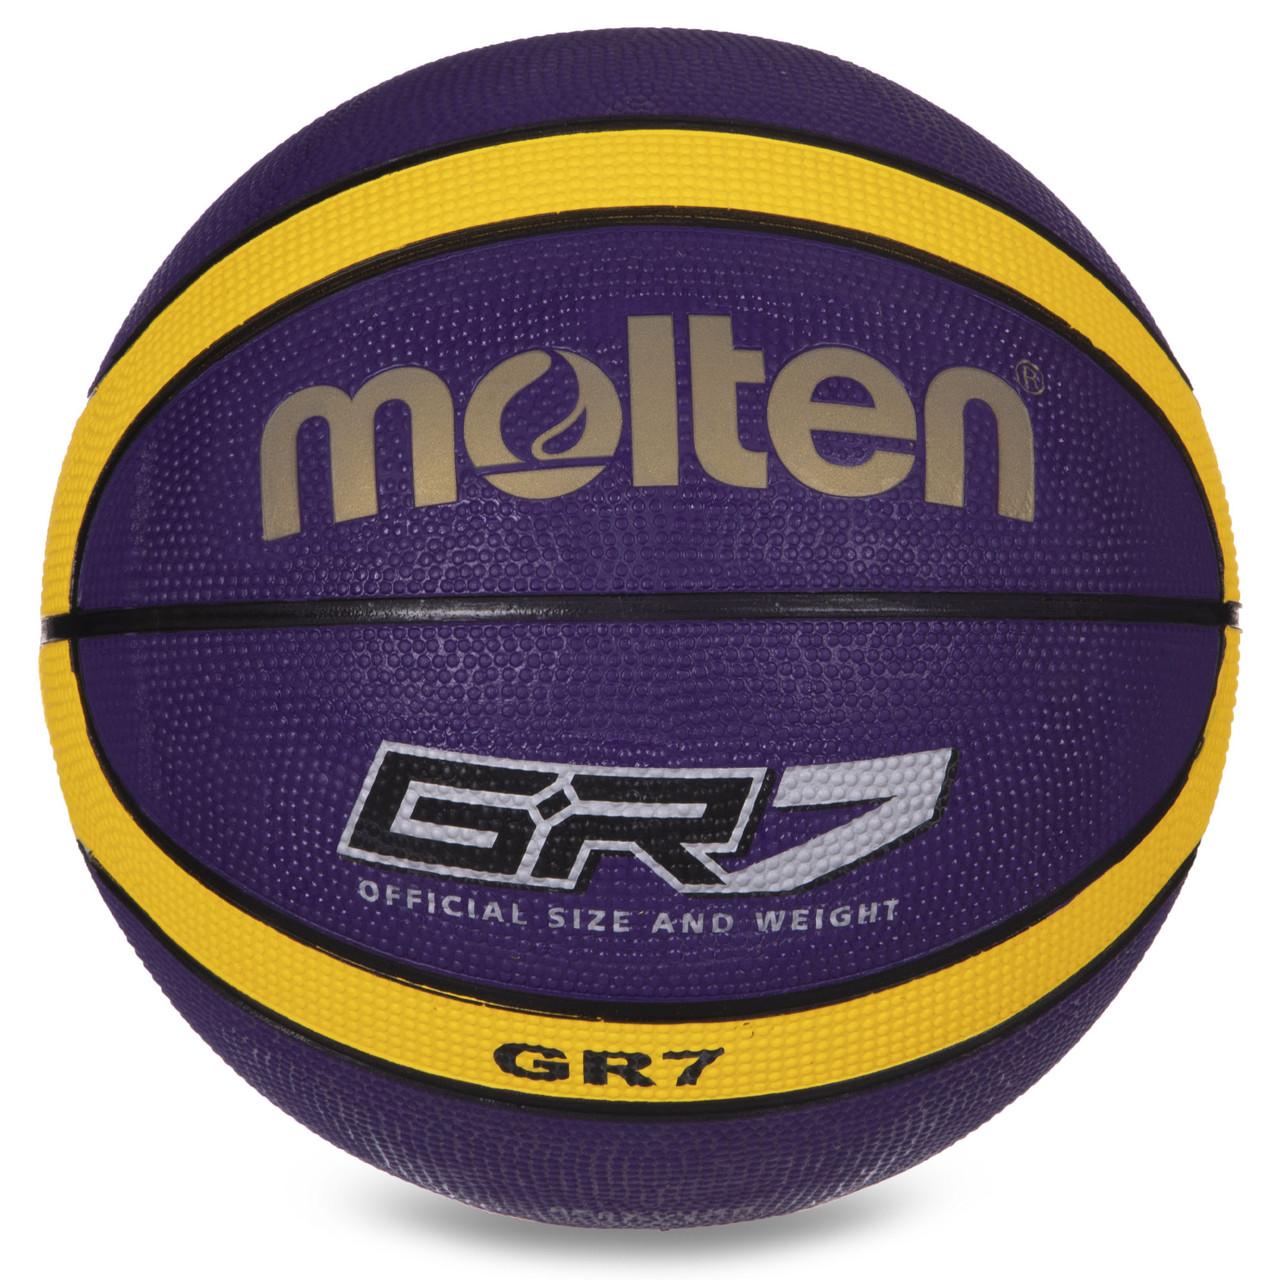 М'яч баскетбольний гумовий MOLTEN GR7 BGR7-VY-SH №7 фіолетовий-жовтий